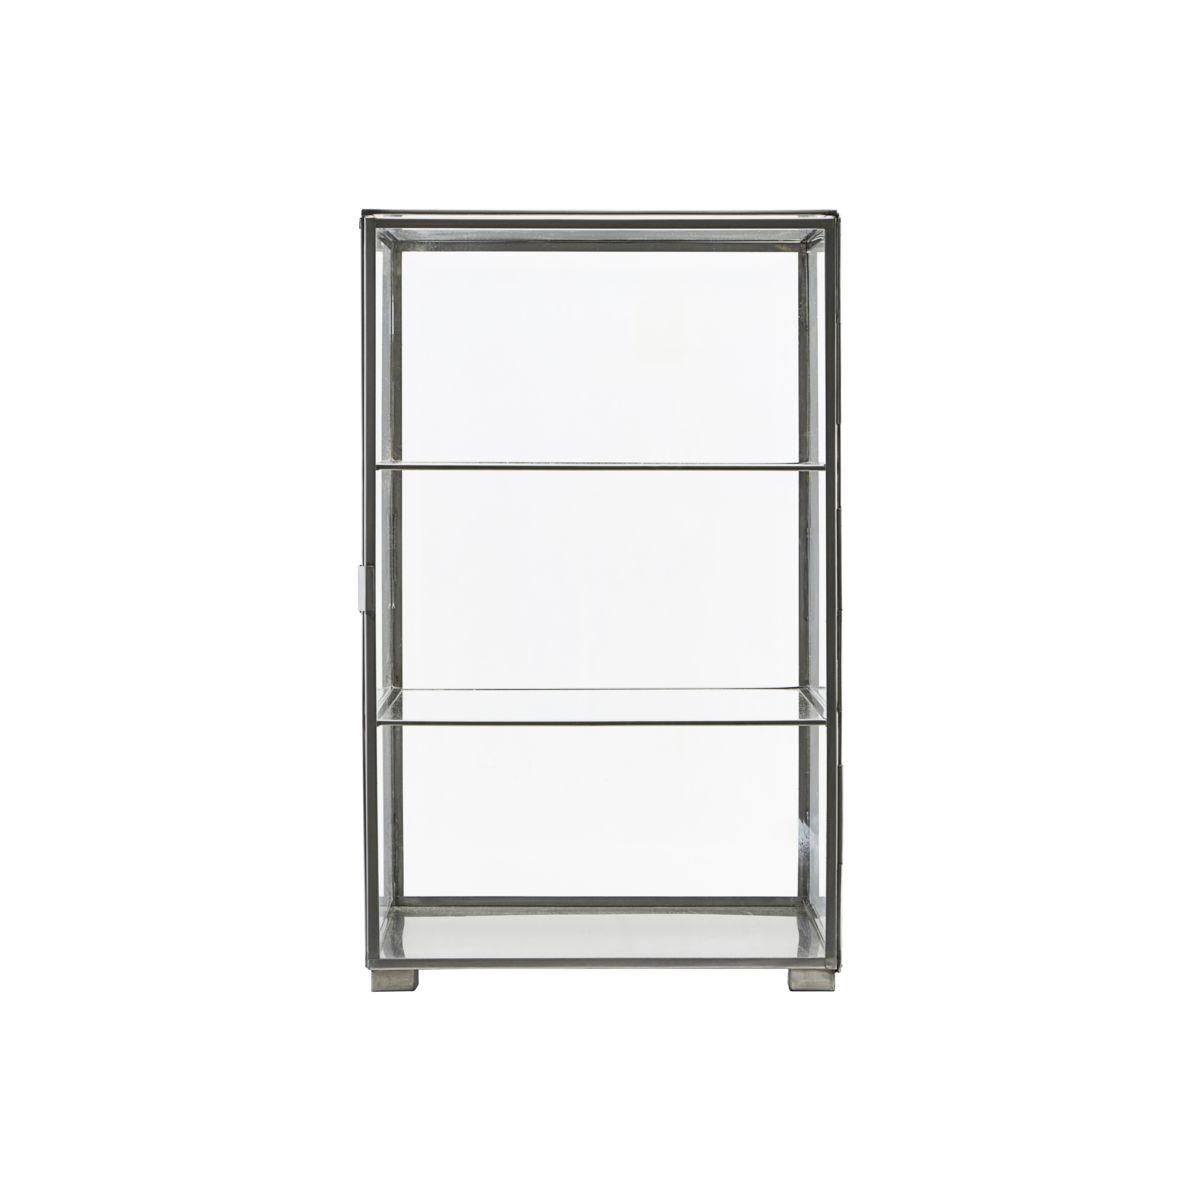 Displayskåp ZINK 35 X 56.6 cm, House Doctor